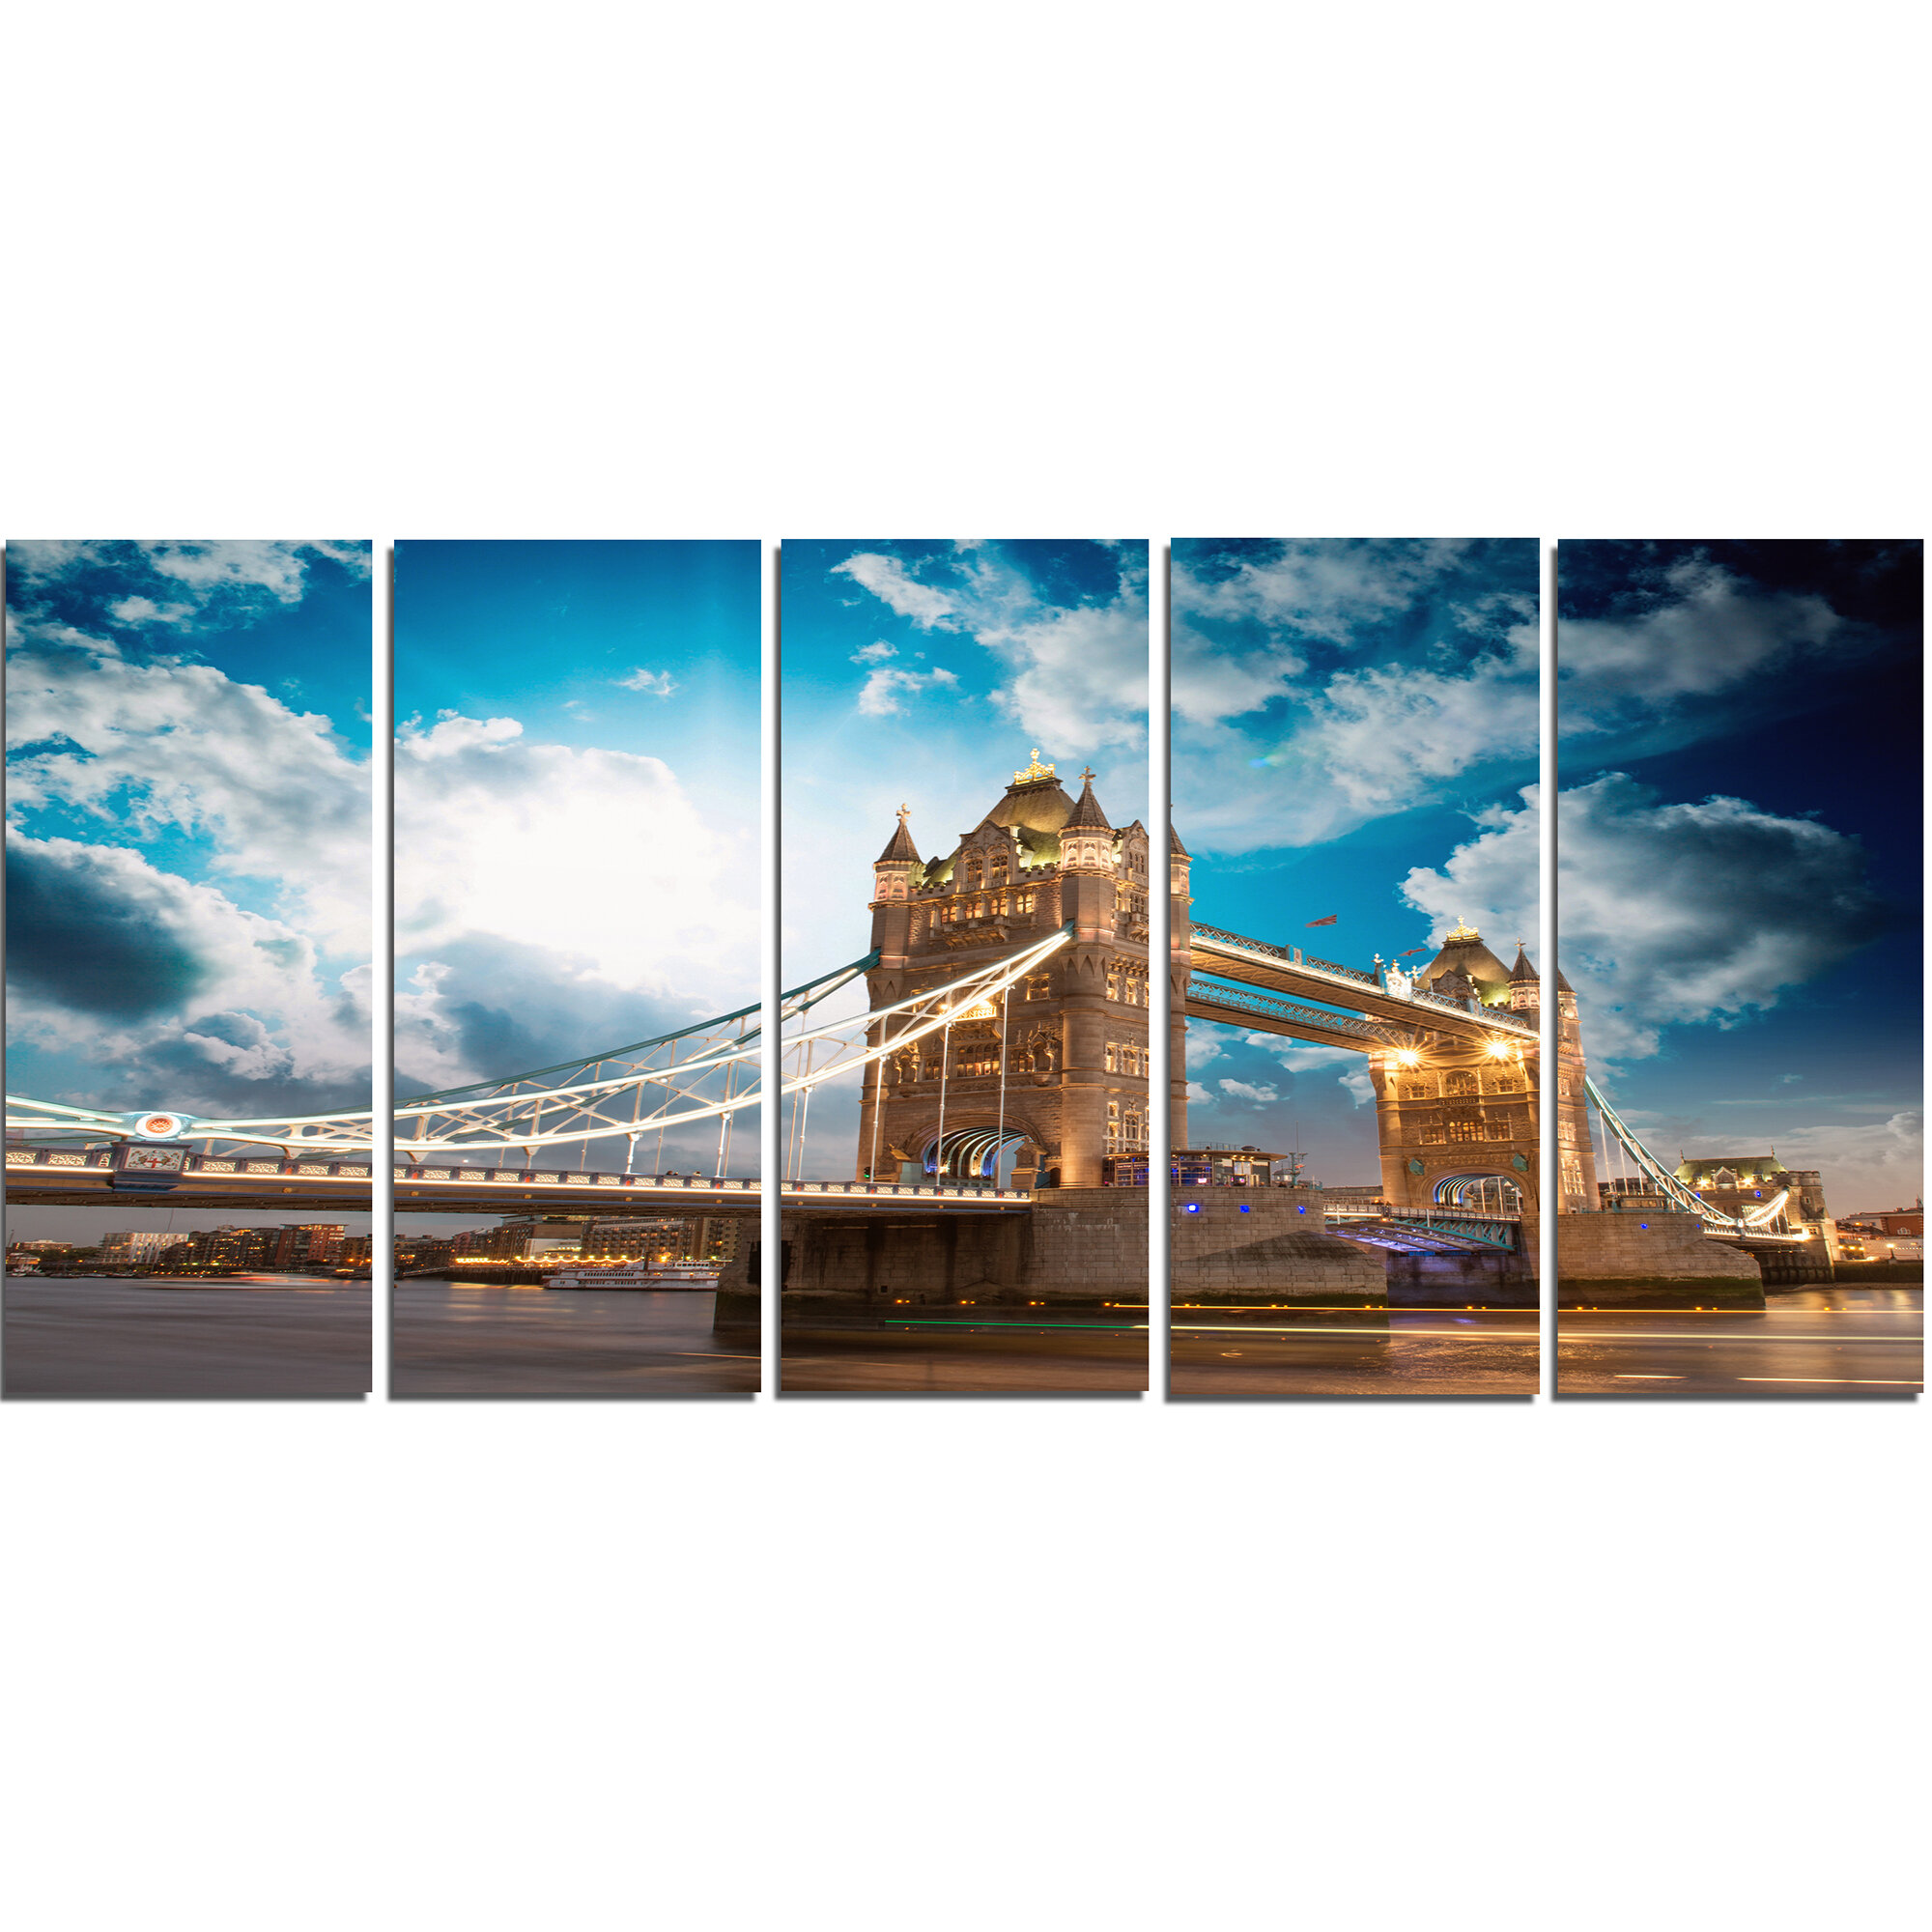 Designart Sunset Over Tower Bridge 5 Piece Wall Art On Wrapped Canvas Set Wayfair